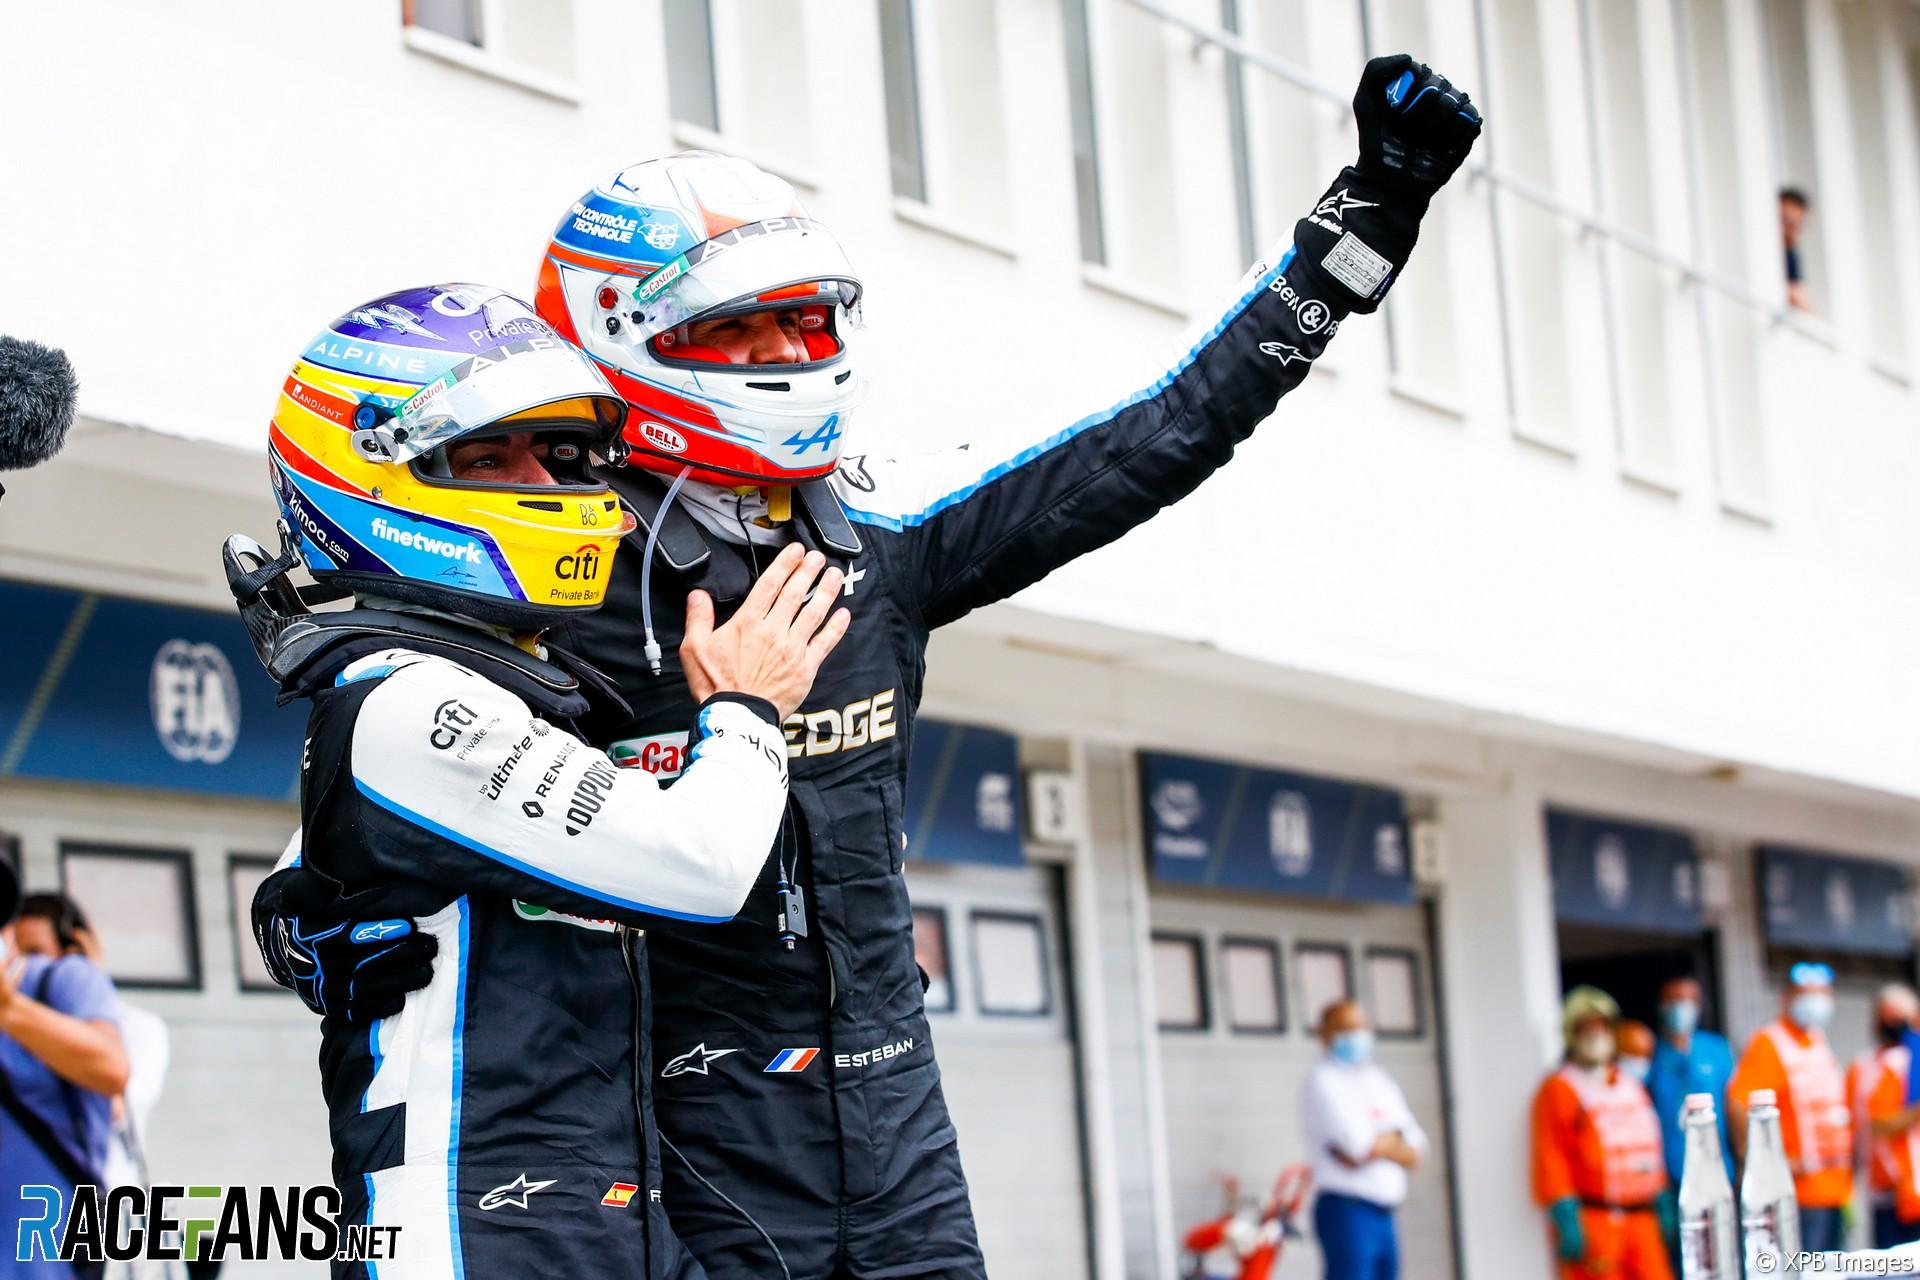 Esteban Ocon, Alpine, Hungaroring, 2021